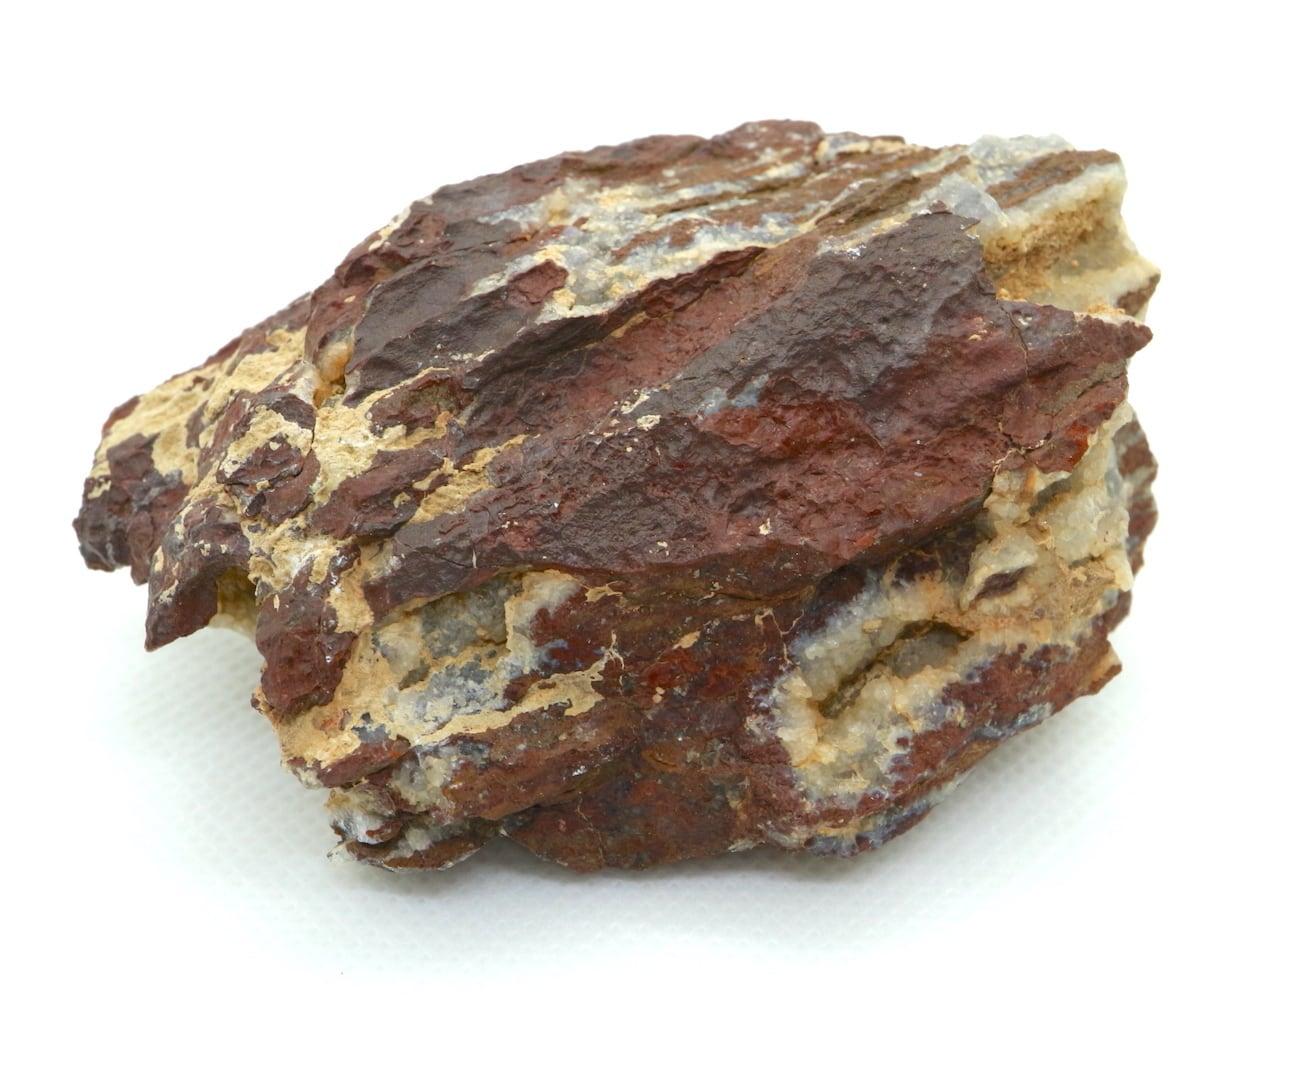 ※SALE※カリフォルニア産 シキャットアゲート  瑪瑙 原石 235,2g AG059 天然石 鉱物 パワーストーン